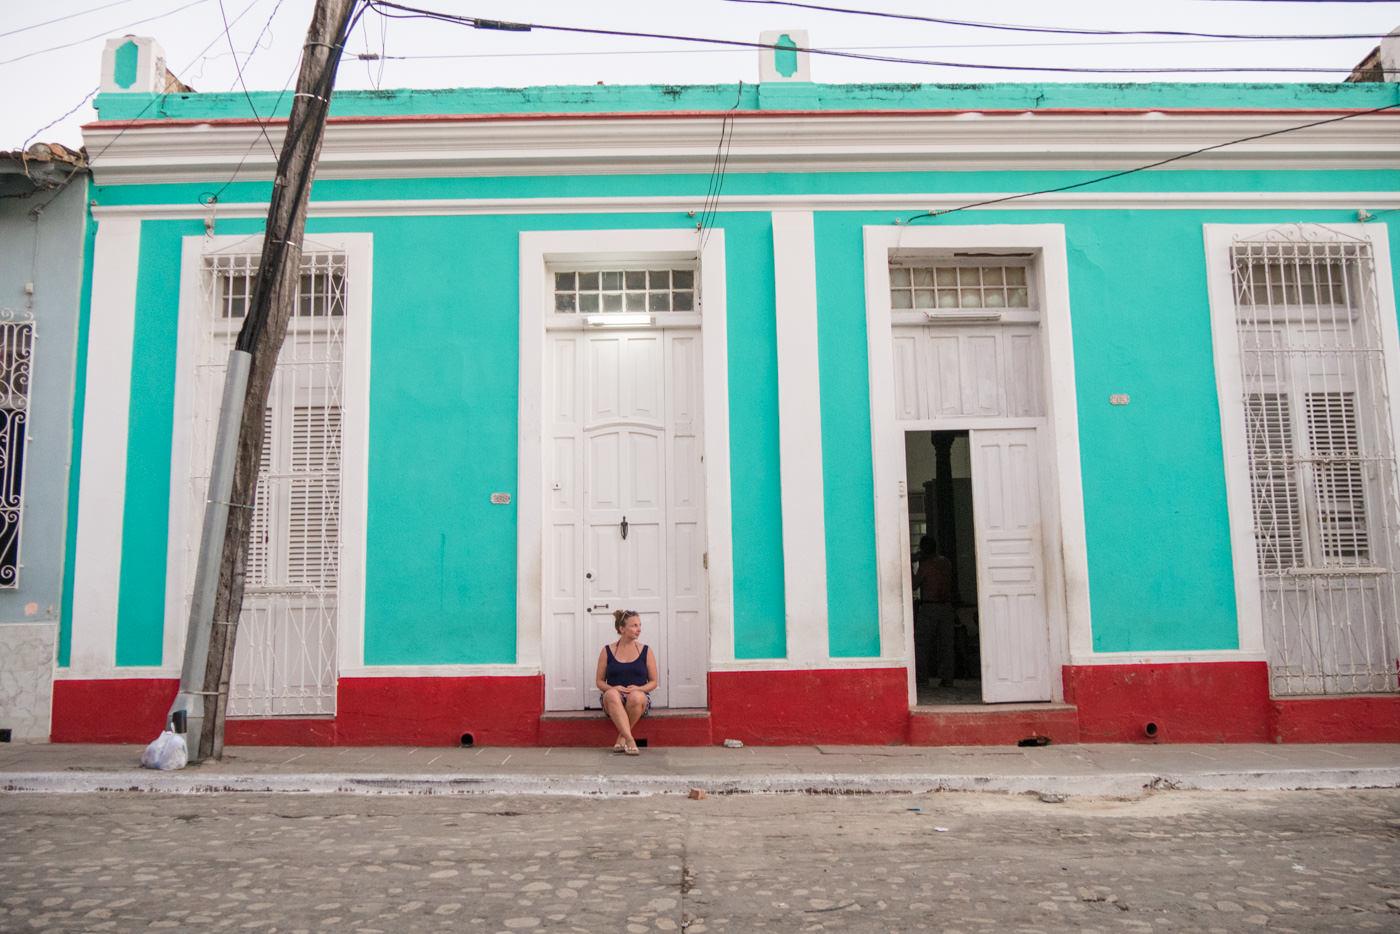 Julia vor bunten Häuserfassaden in Trinidad, Kuba